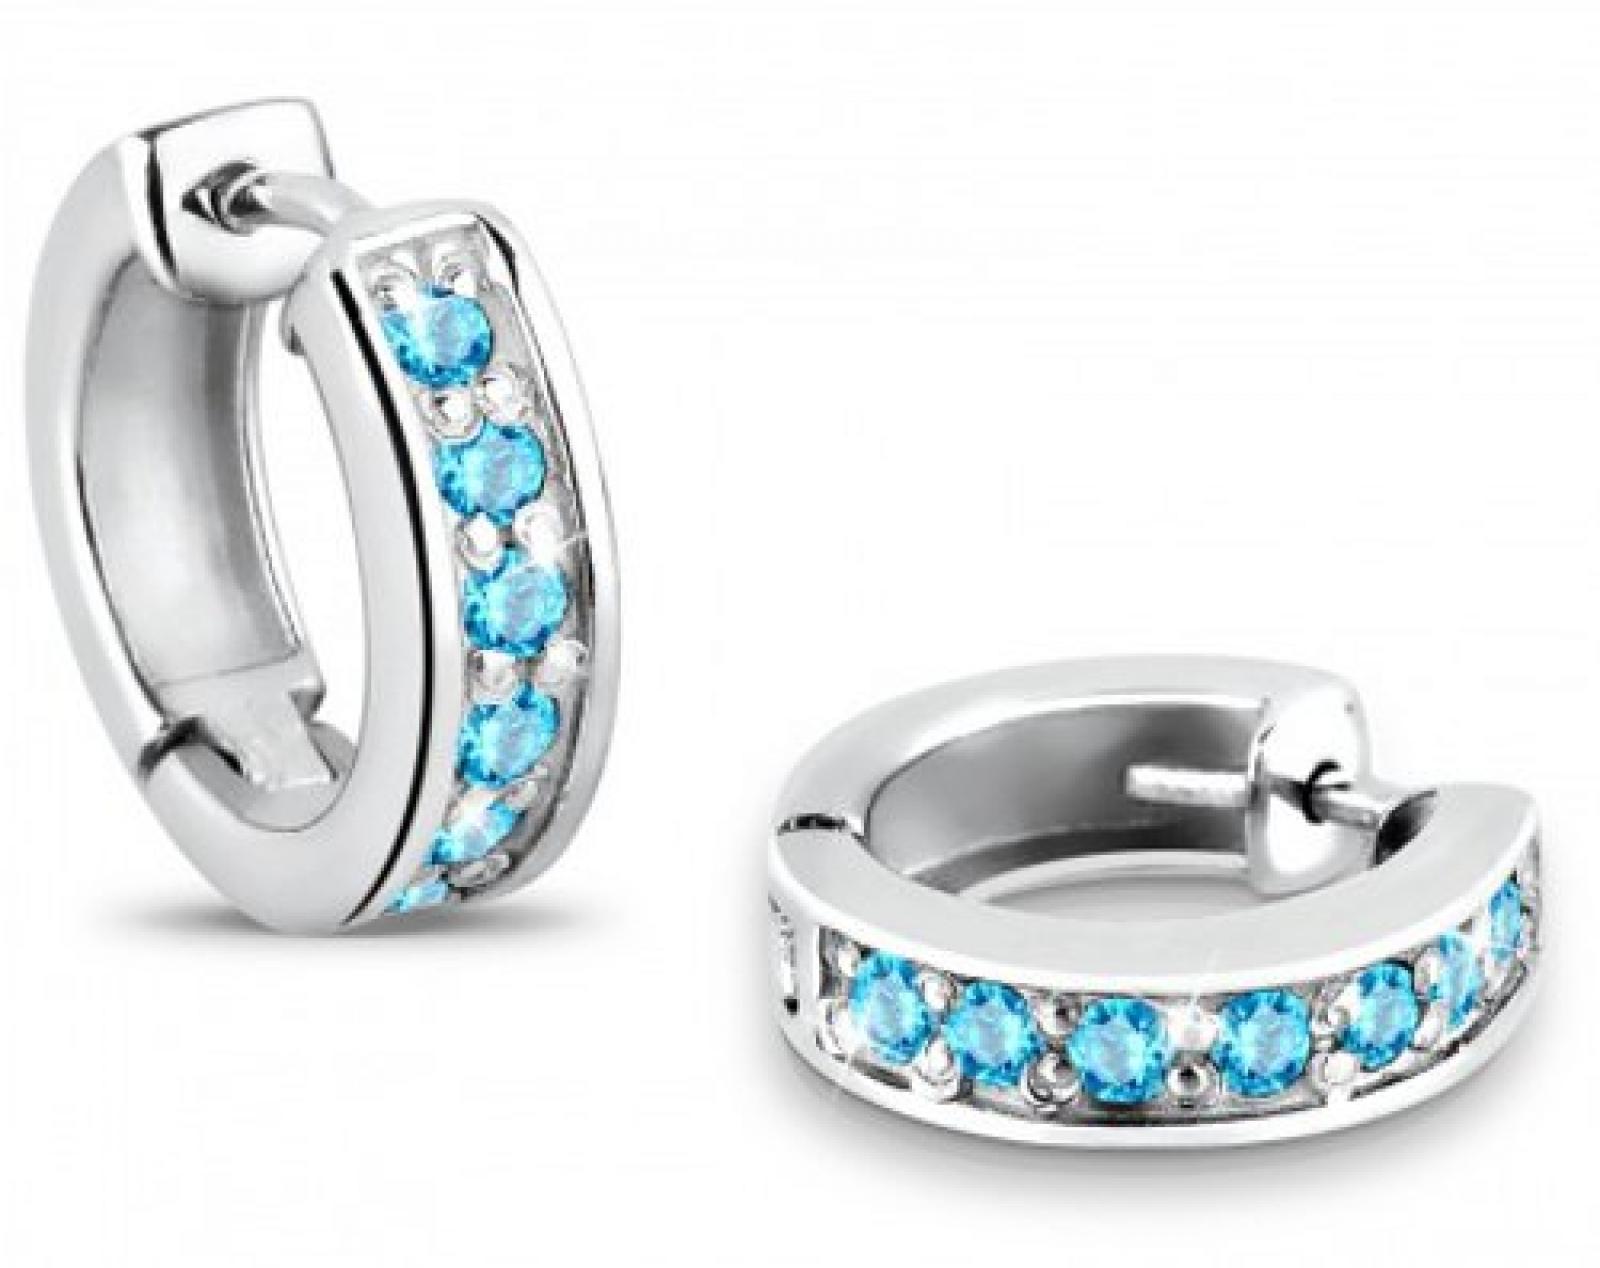 Elli Damen-Ohrringe Klassik 925 Silber 03200920